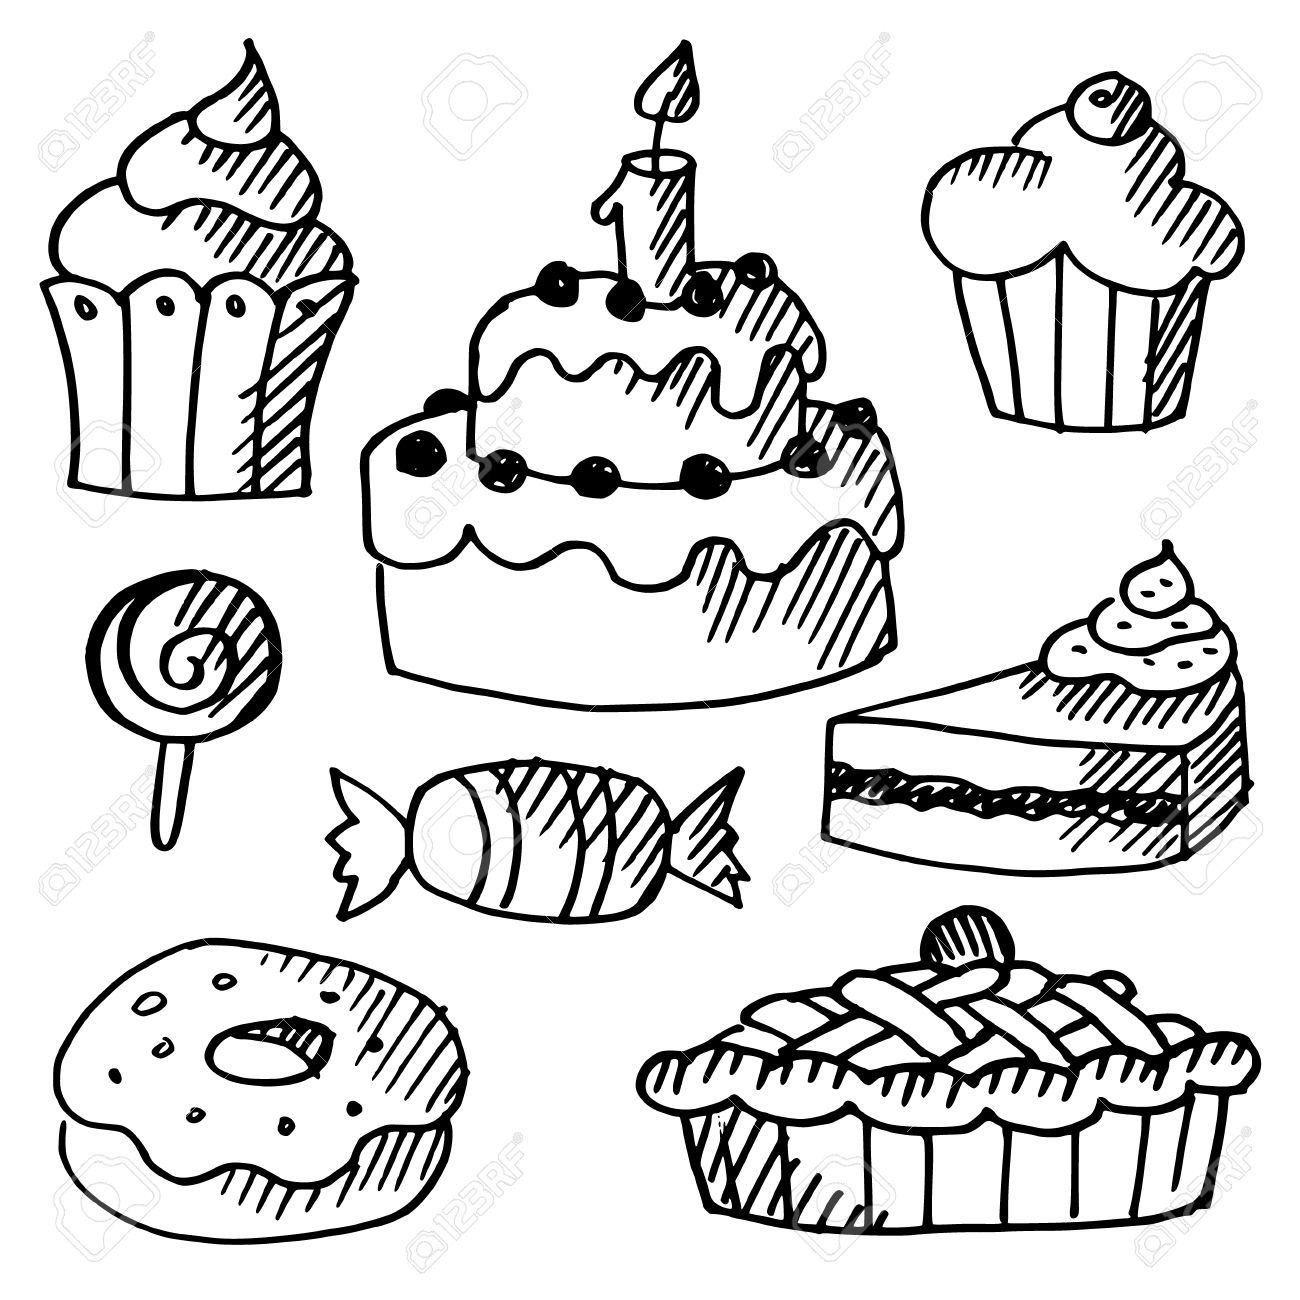 Cupcake Black And White Drawing At Getdrawings